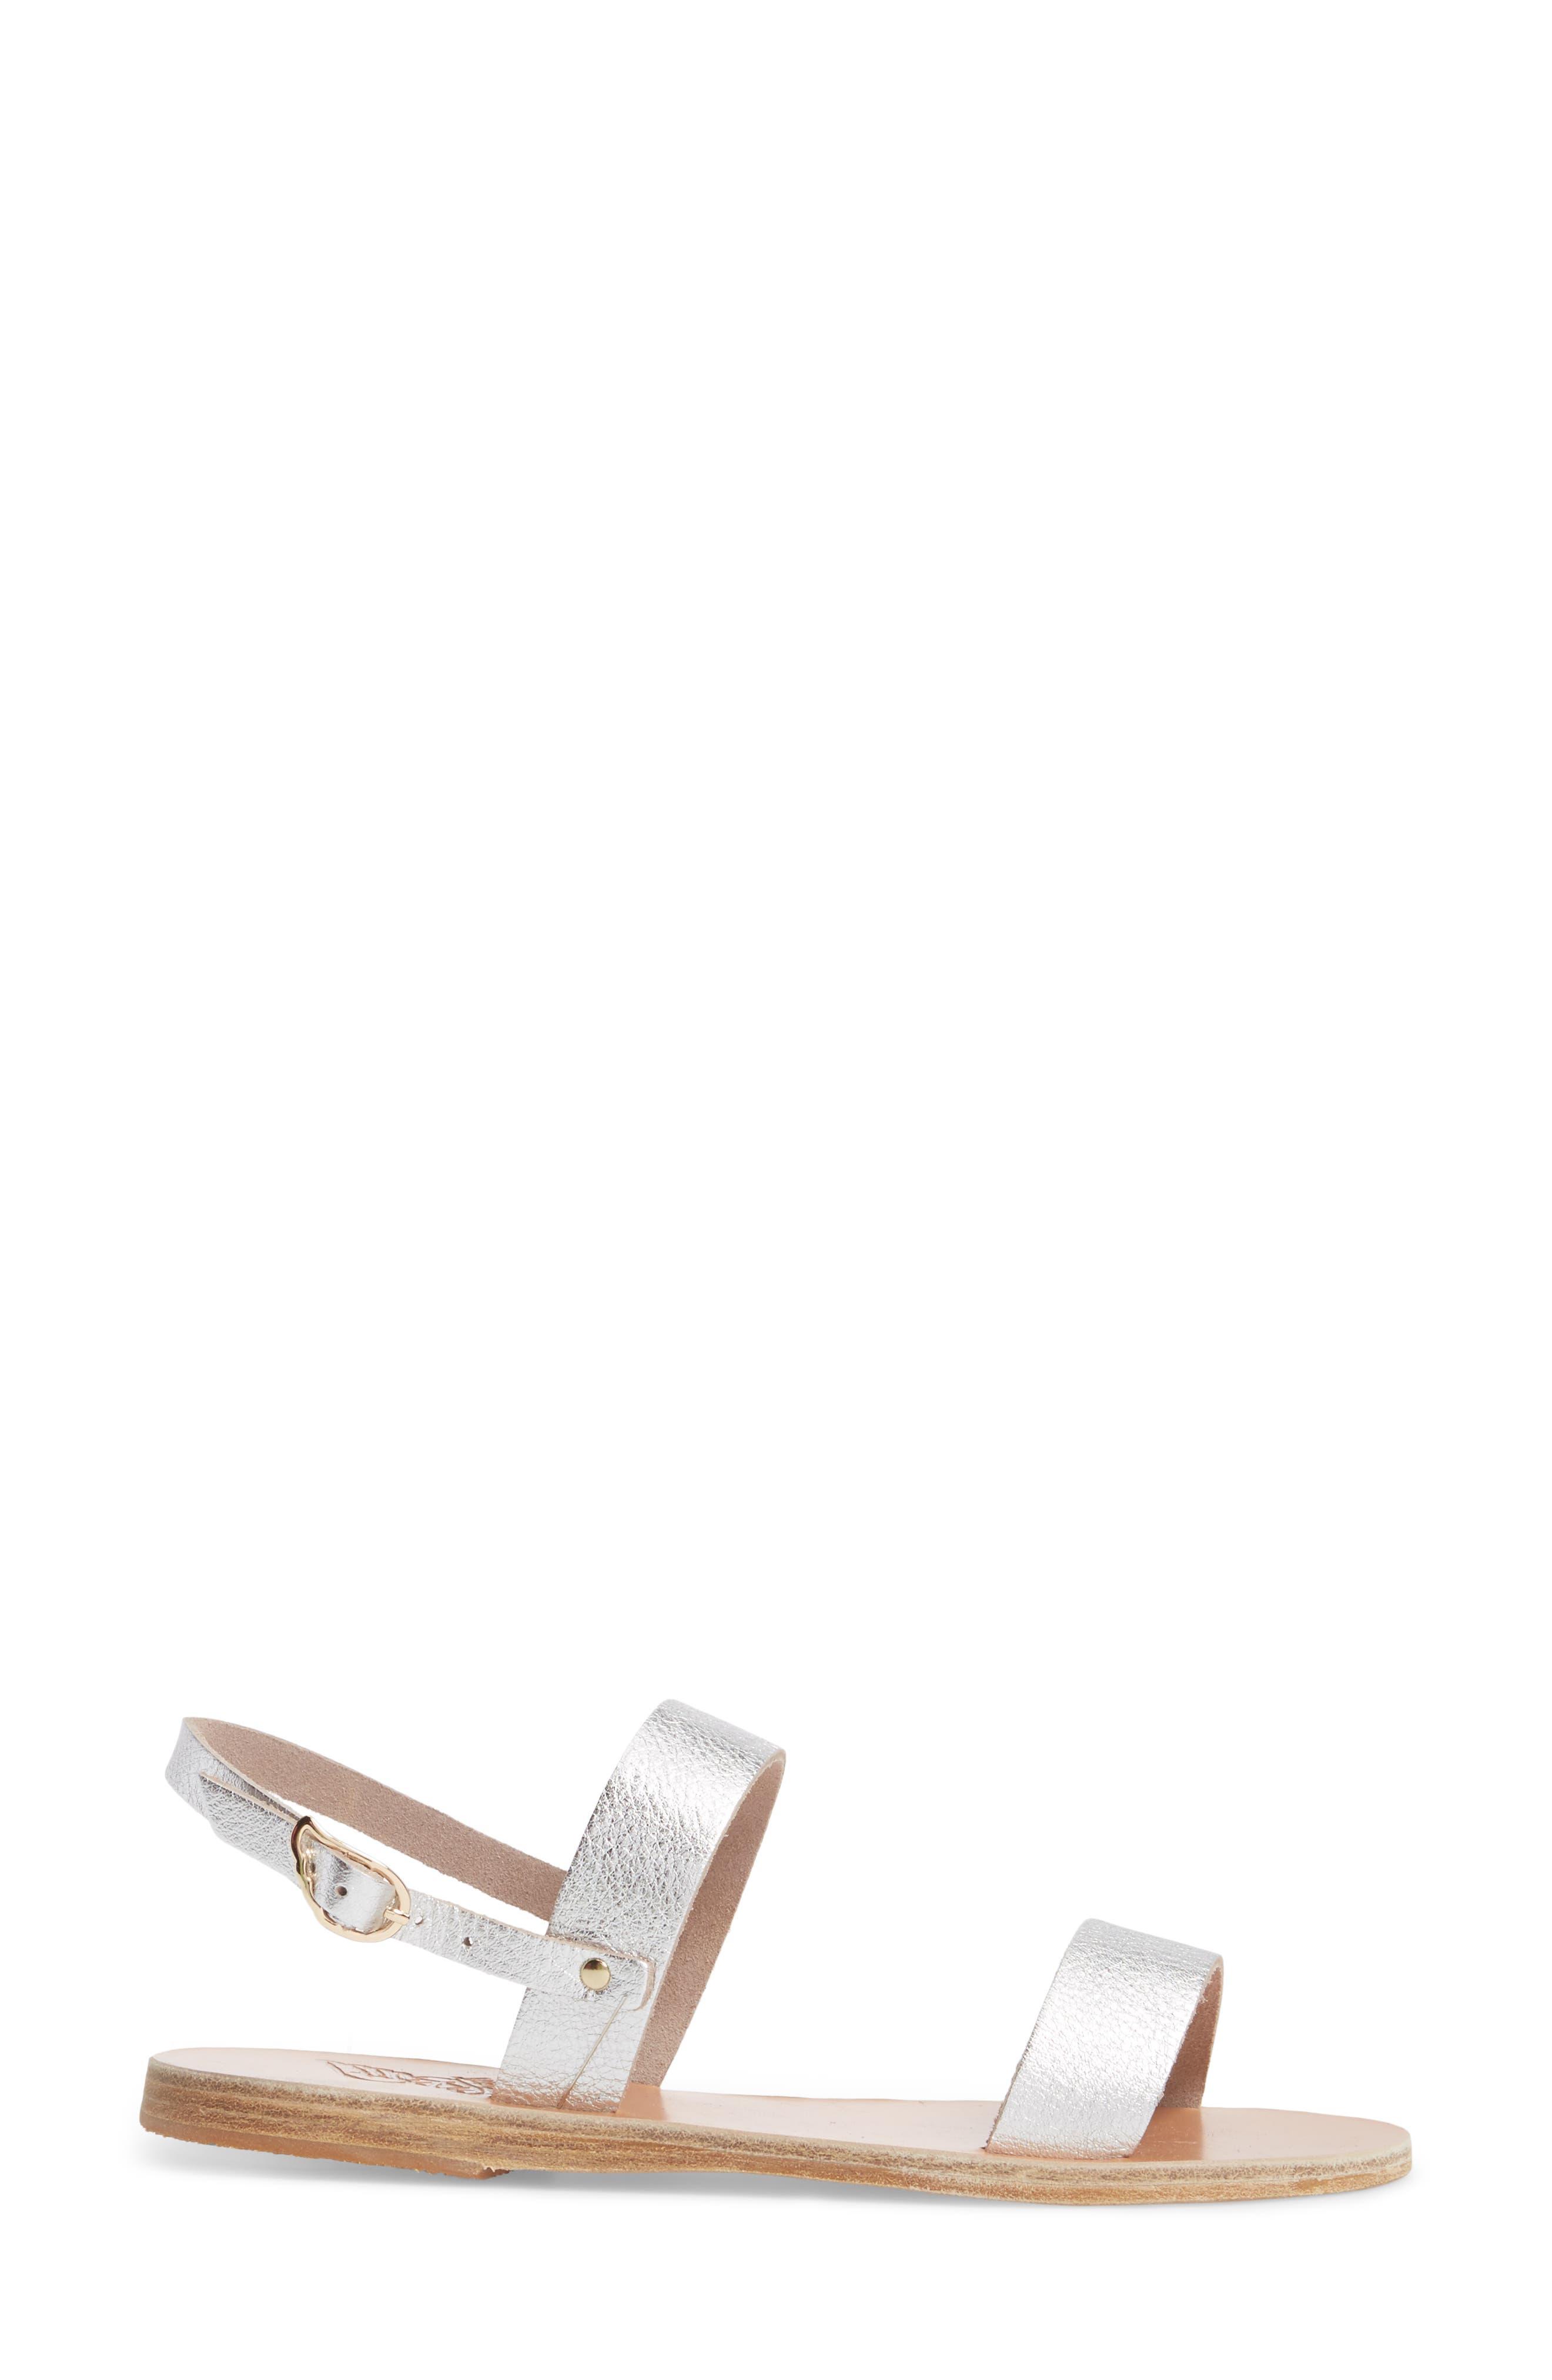 Alternate Image 3  - Ancient Greek Sandals Clio Slingback Sandal (Women)